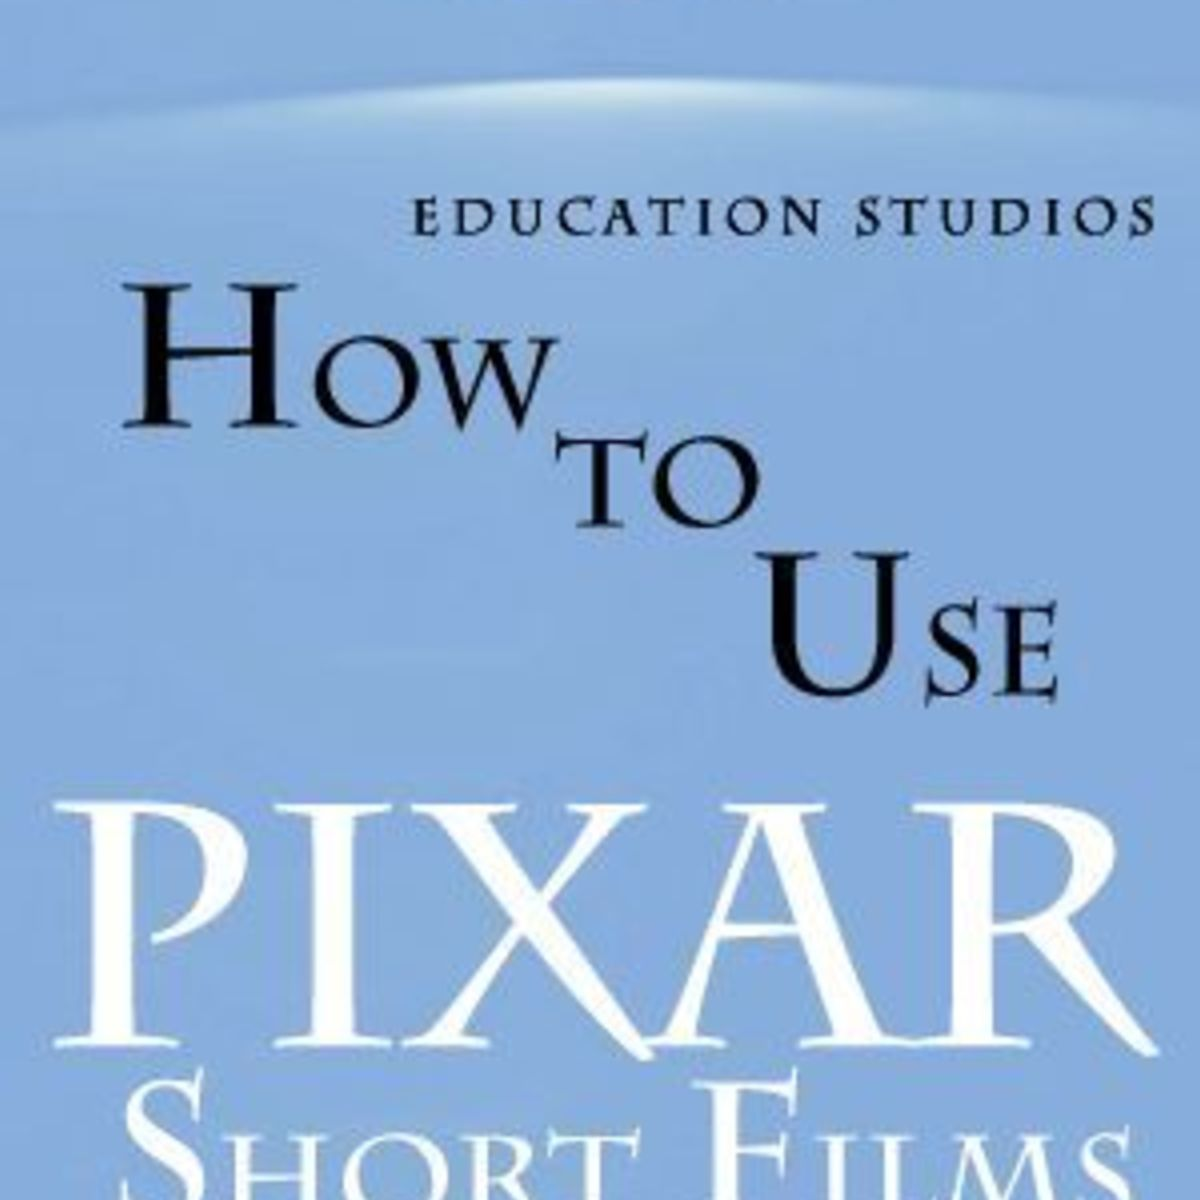 Teaching Plot Elements Using Pixar Short Films